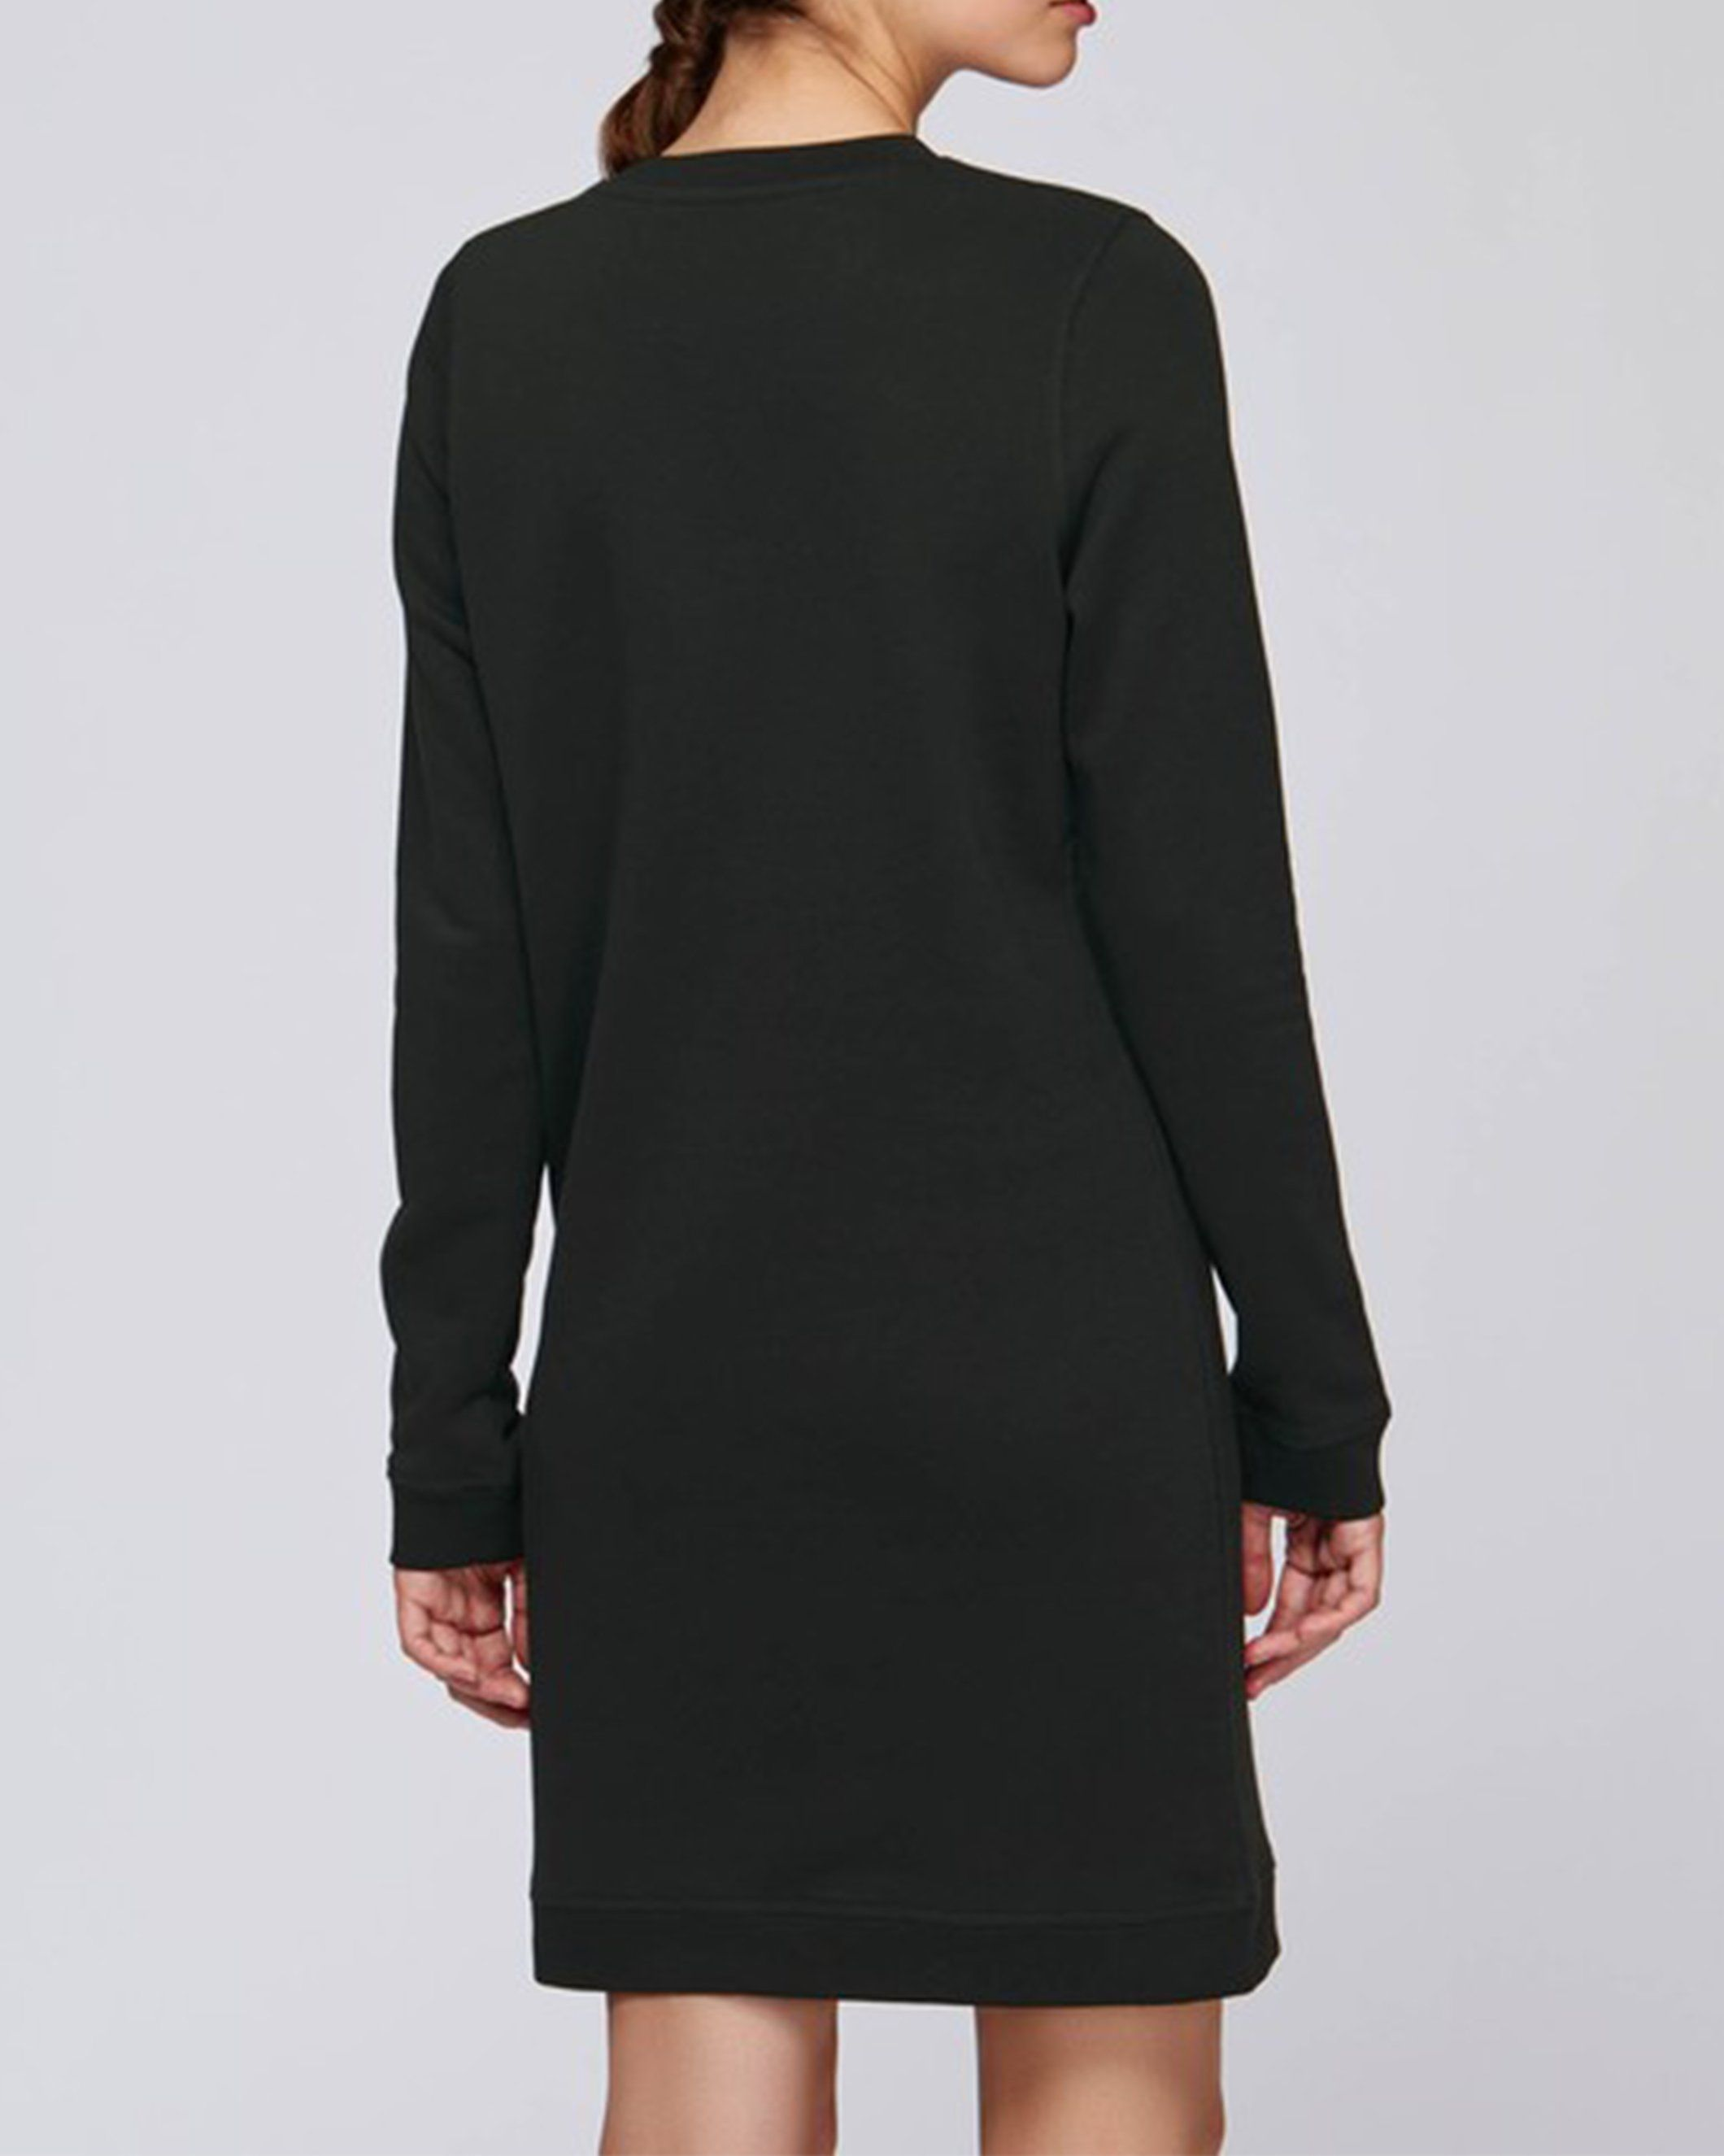 Merkaba Women's Crew Neck Dress in Black